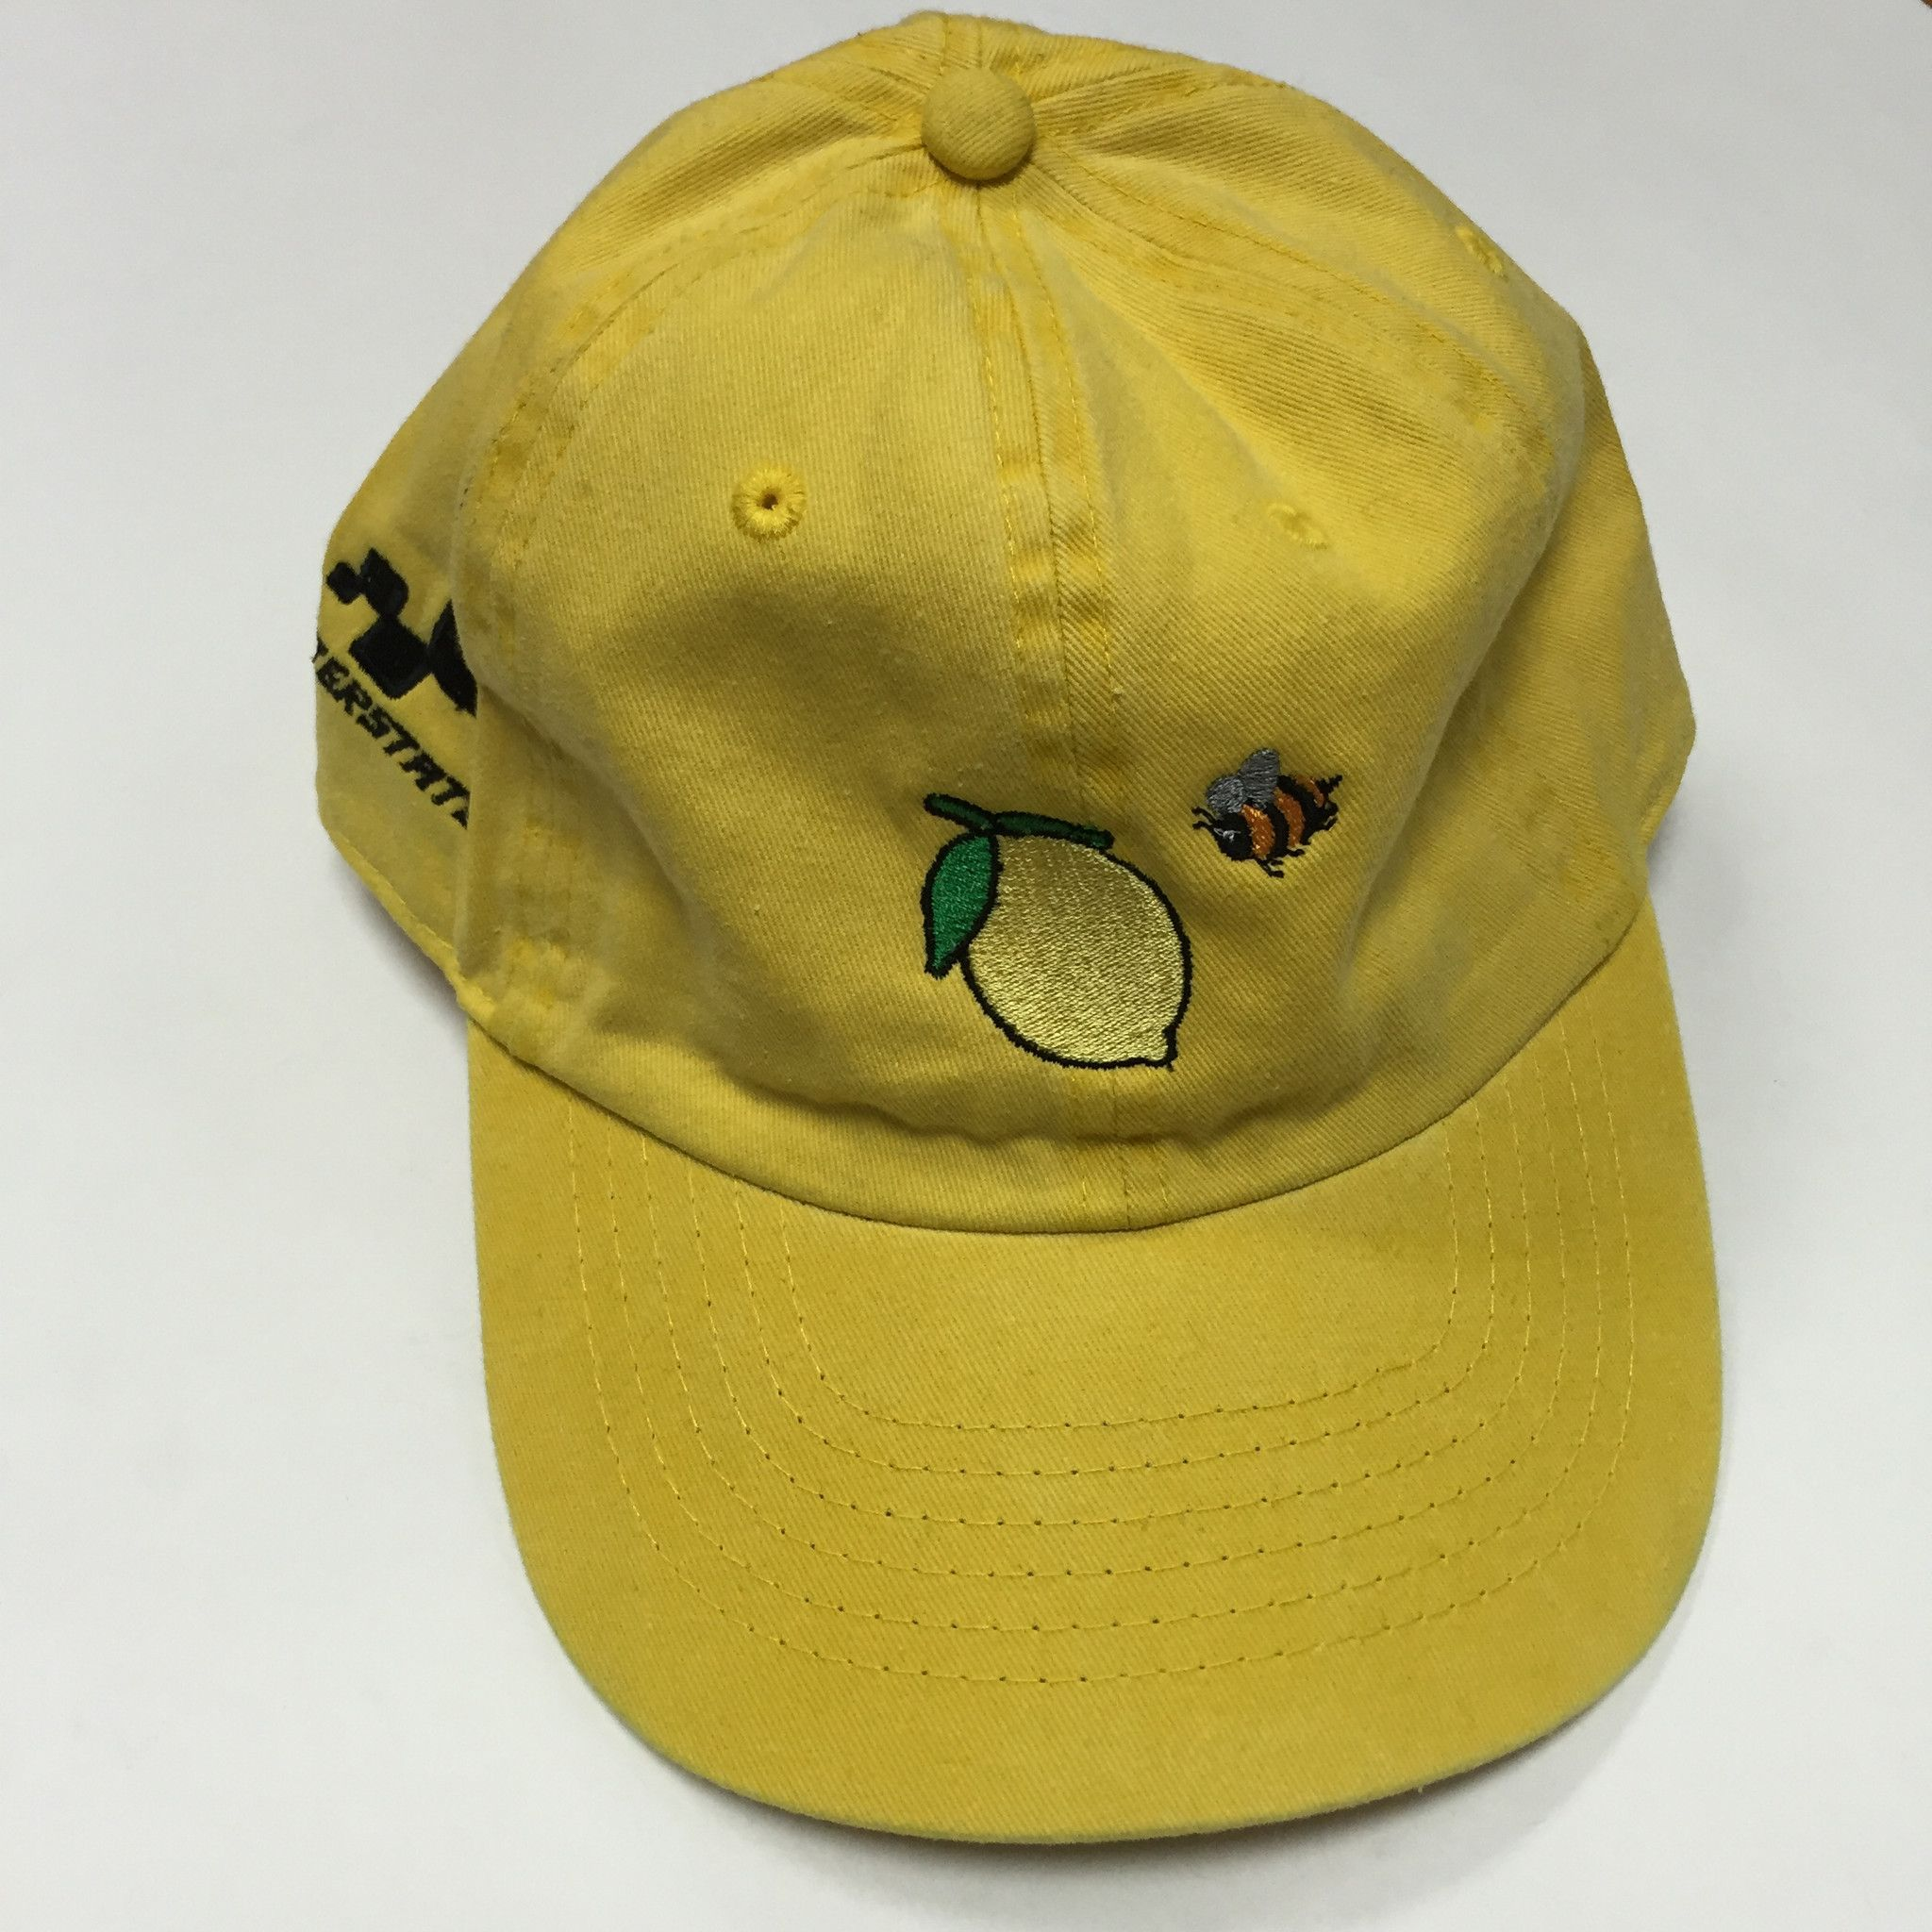 d9cec1f19b0 Yellow Lemon x Bee Dad Hat